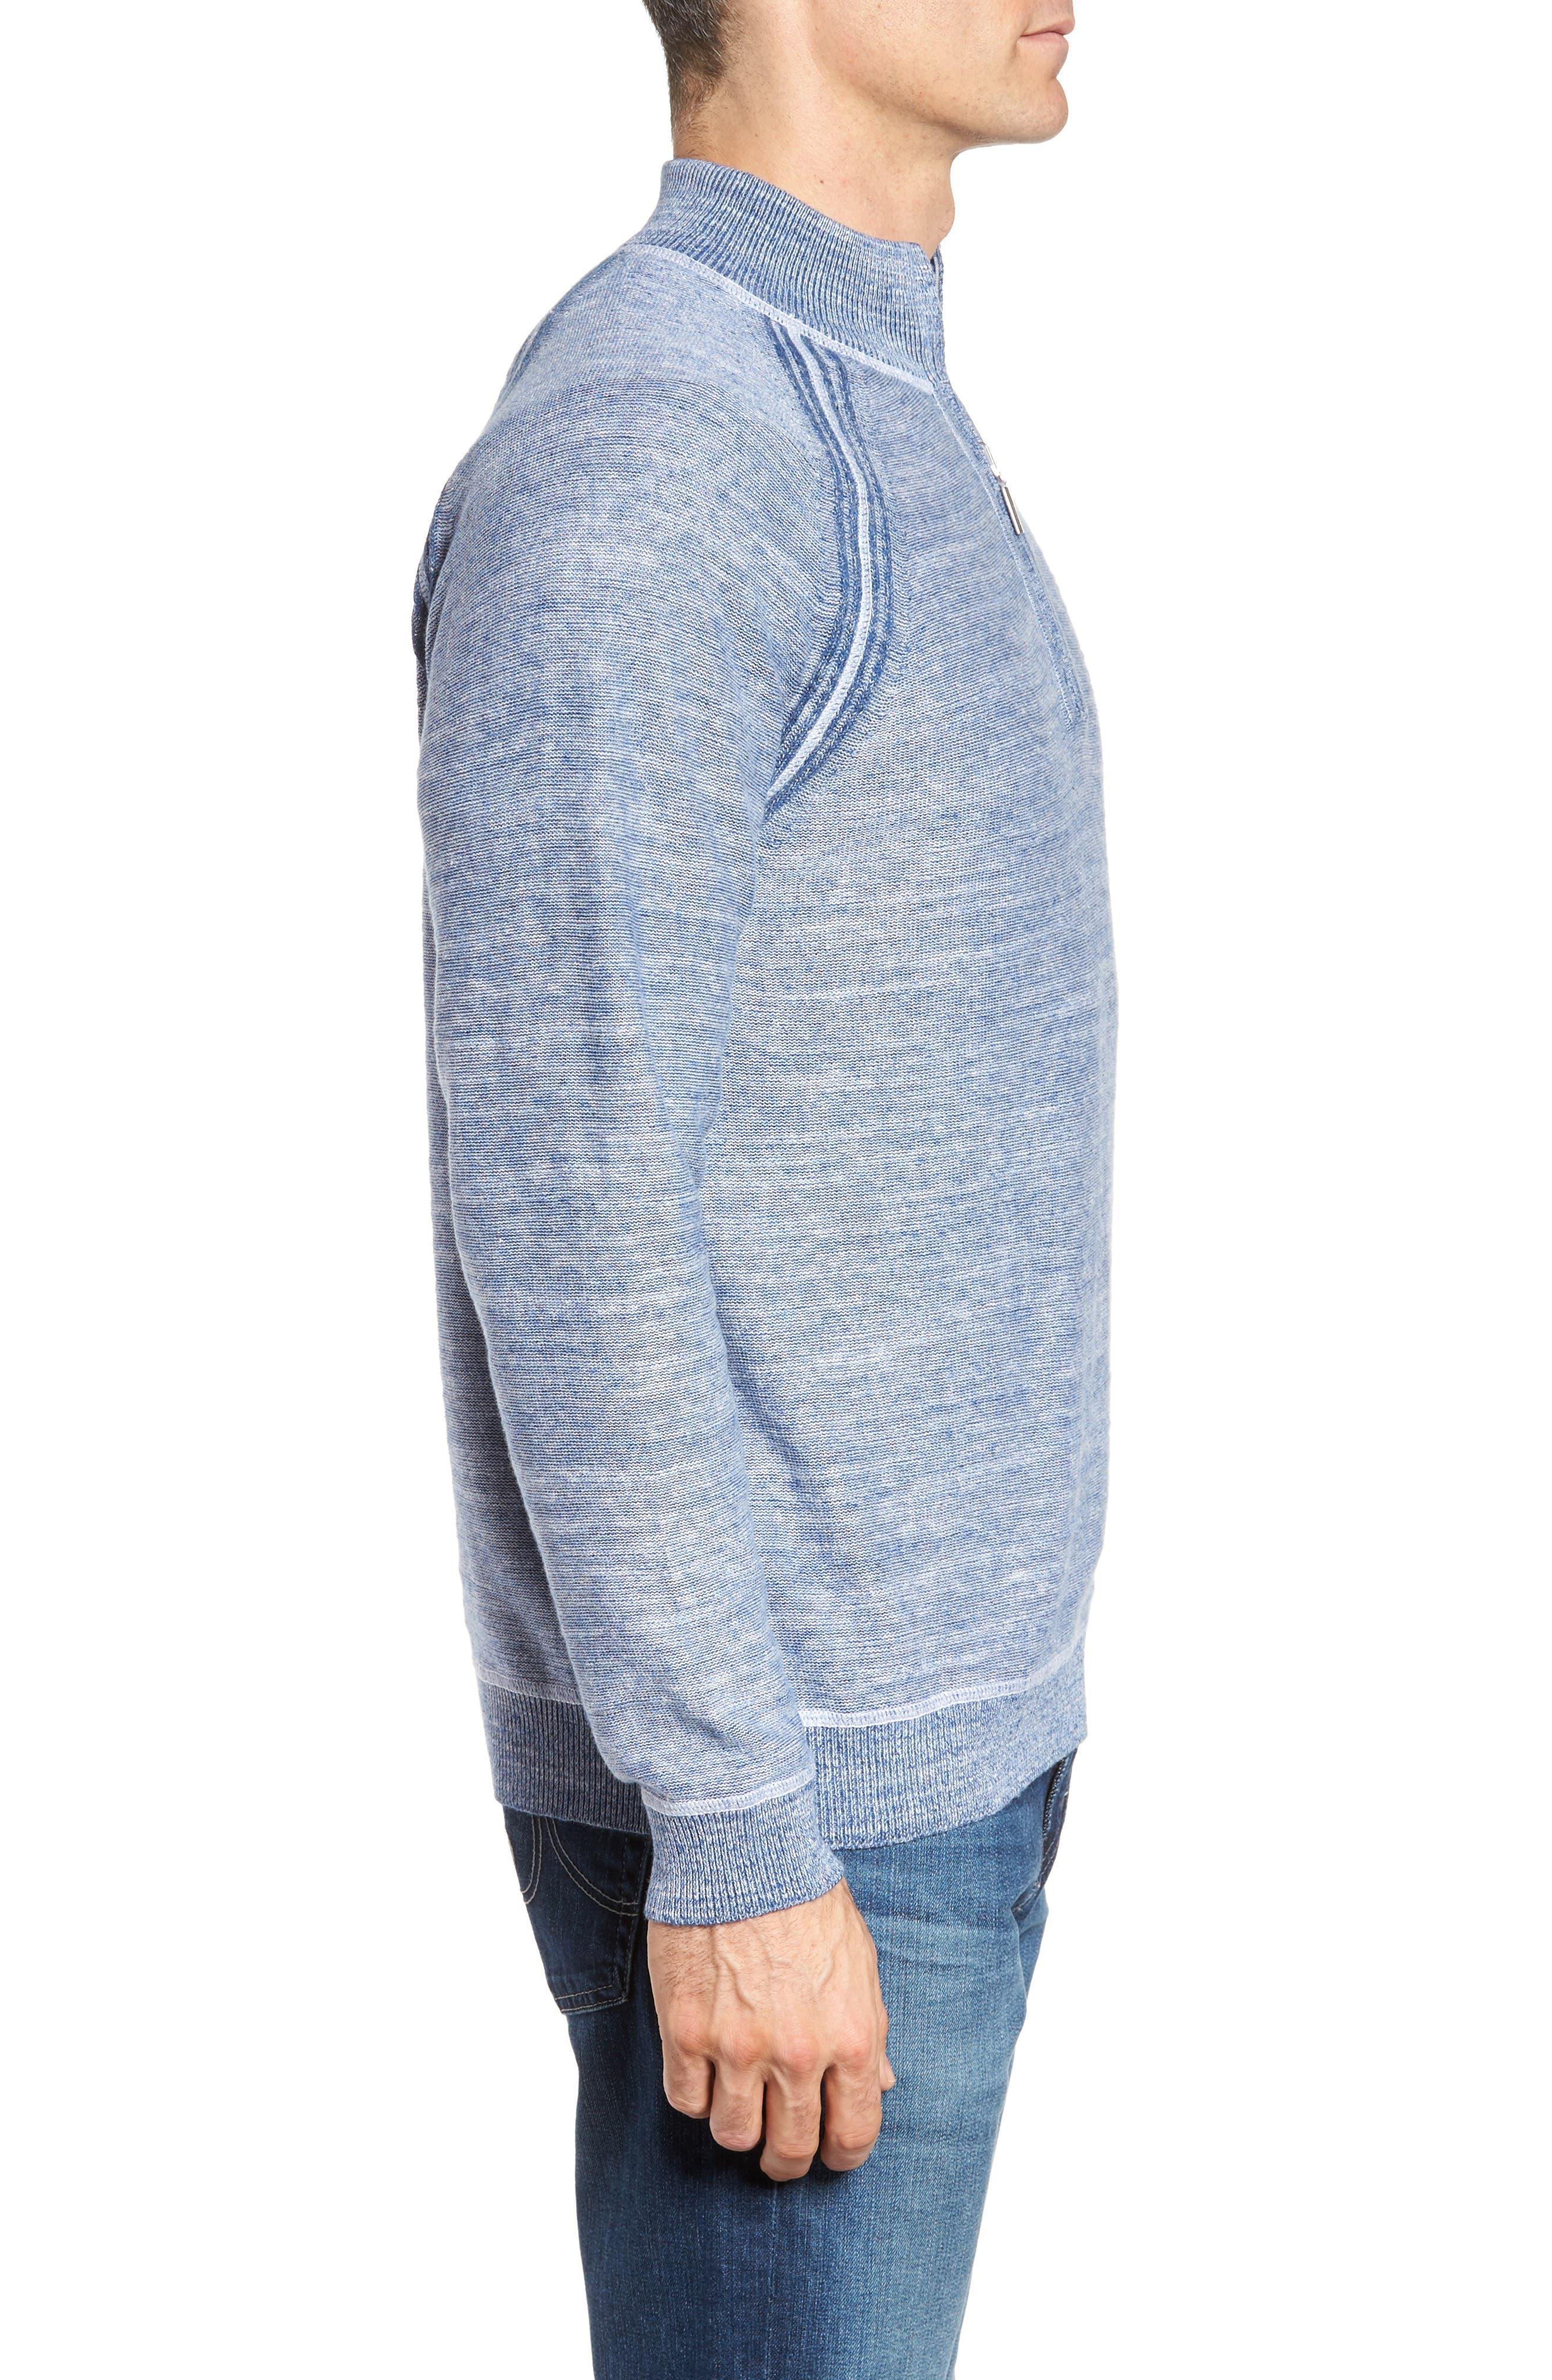 Sandy Bay Half-Zip Pullover,                             Alternate thumbnail 3, color,                             Galaxy Blue Heather